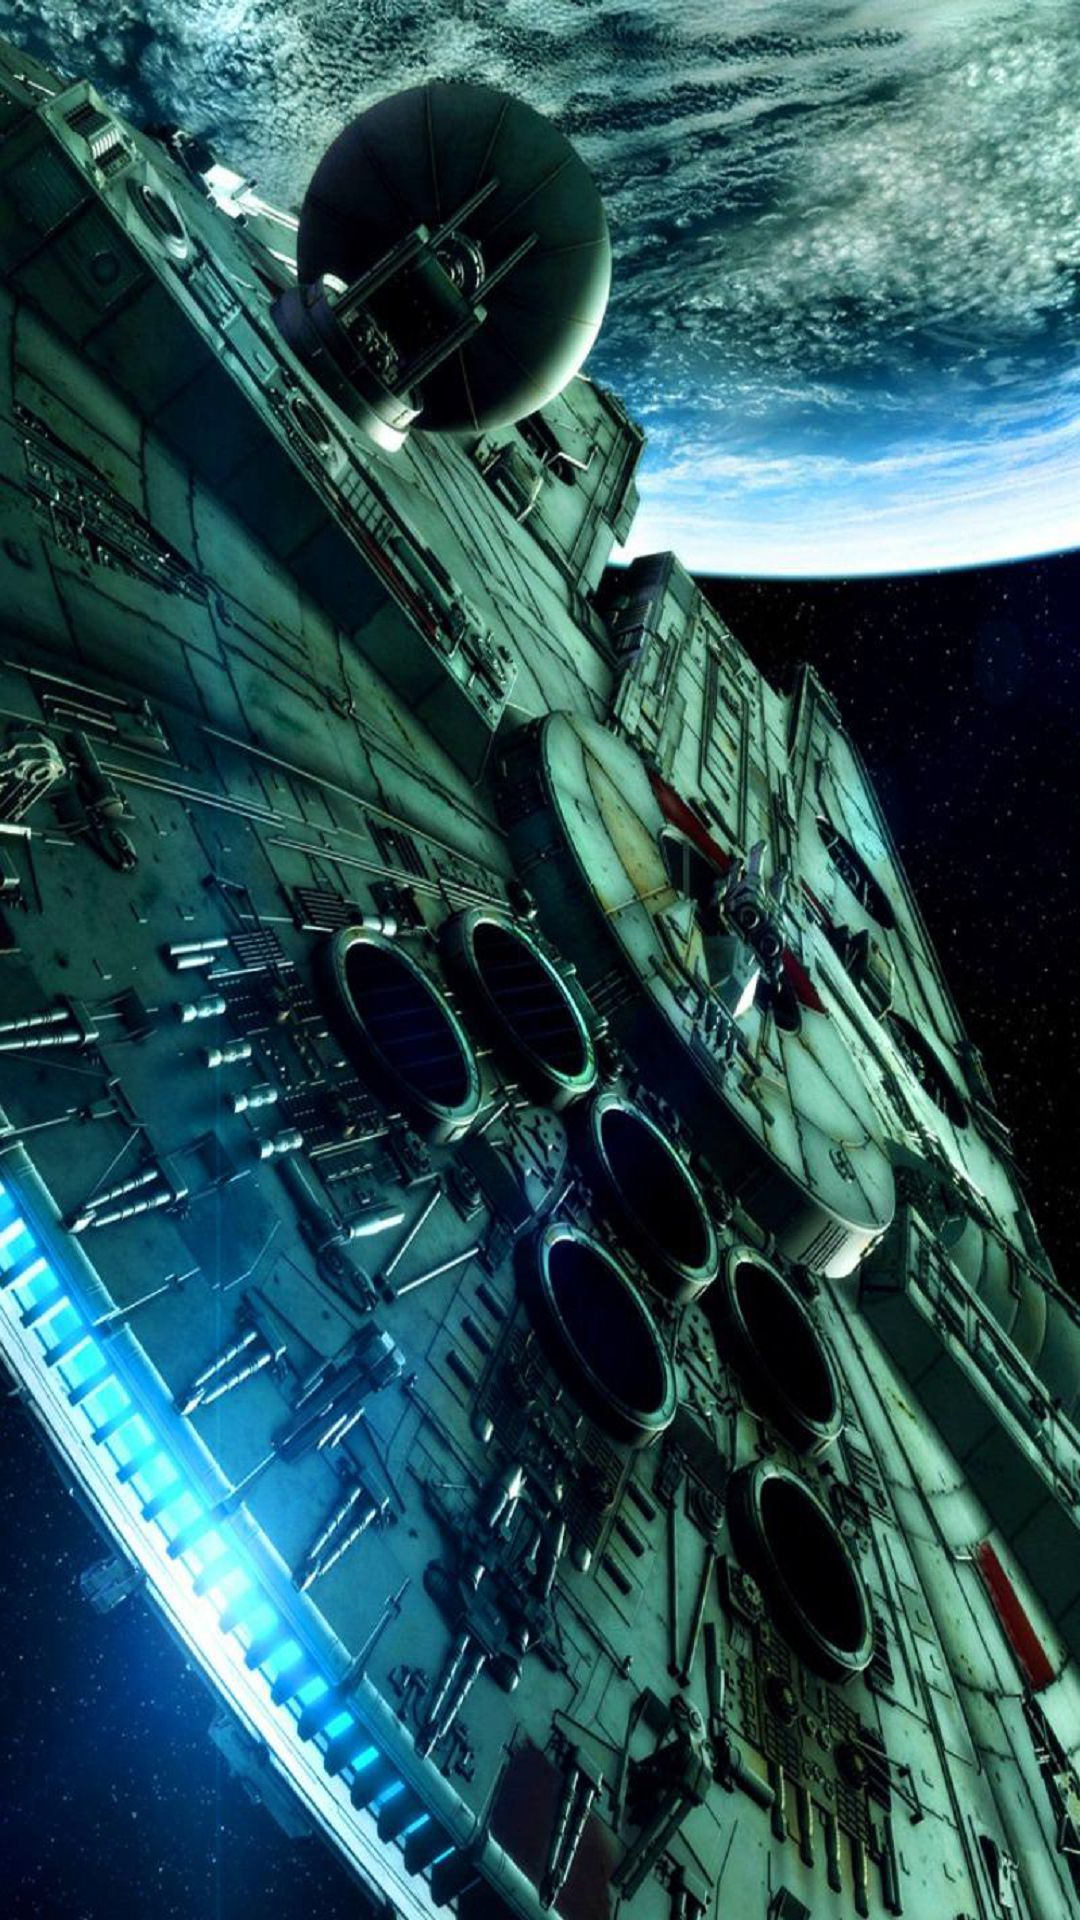 49 Star Wars Iphone Wallpaper Hd On Wallpapersafari